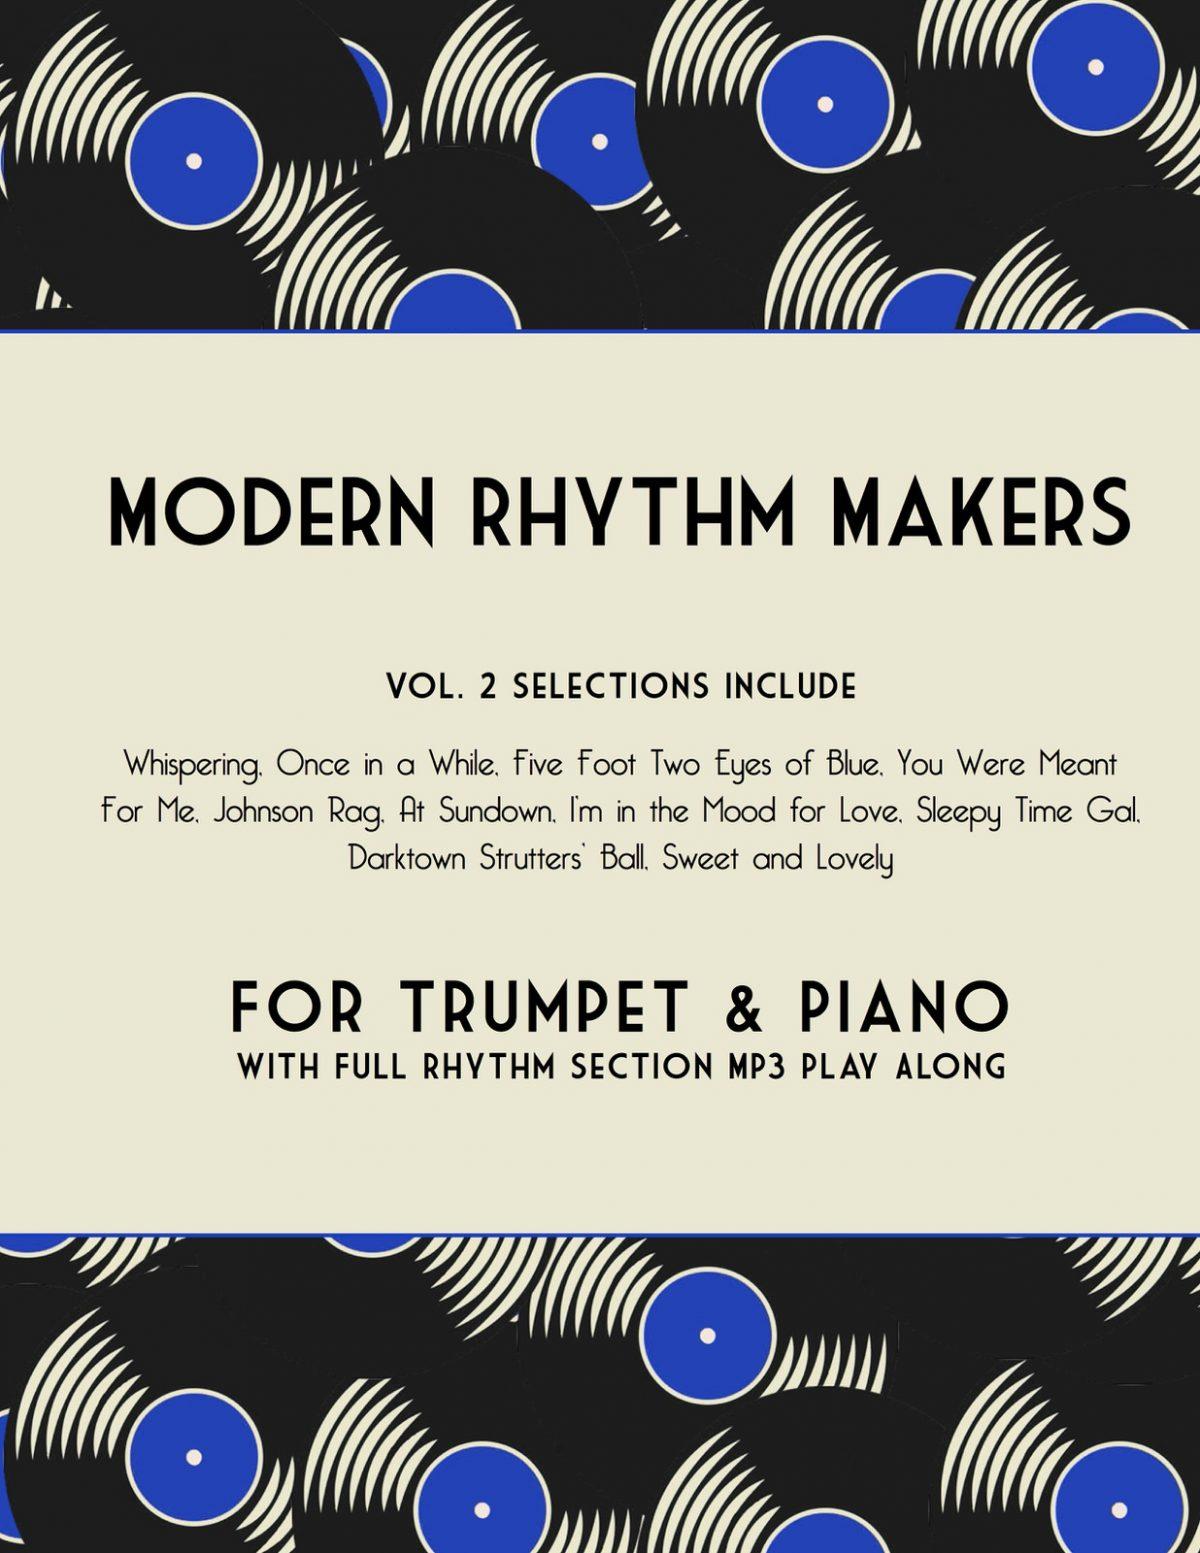 (Playalong)Various, Modern Rhythm Makers Playalong-p01